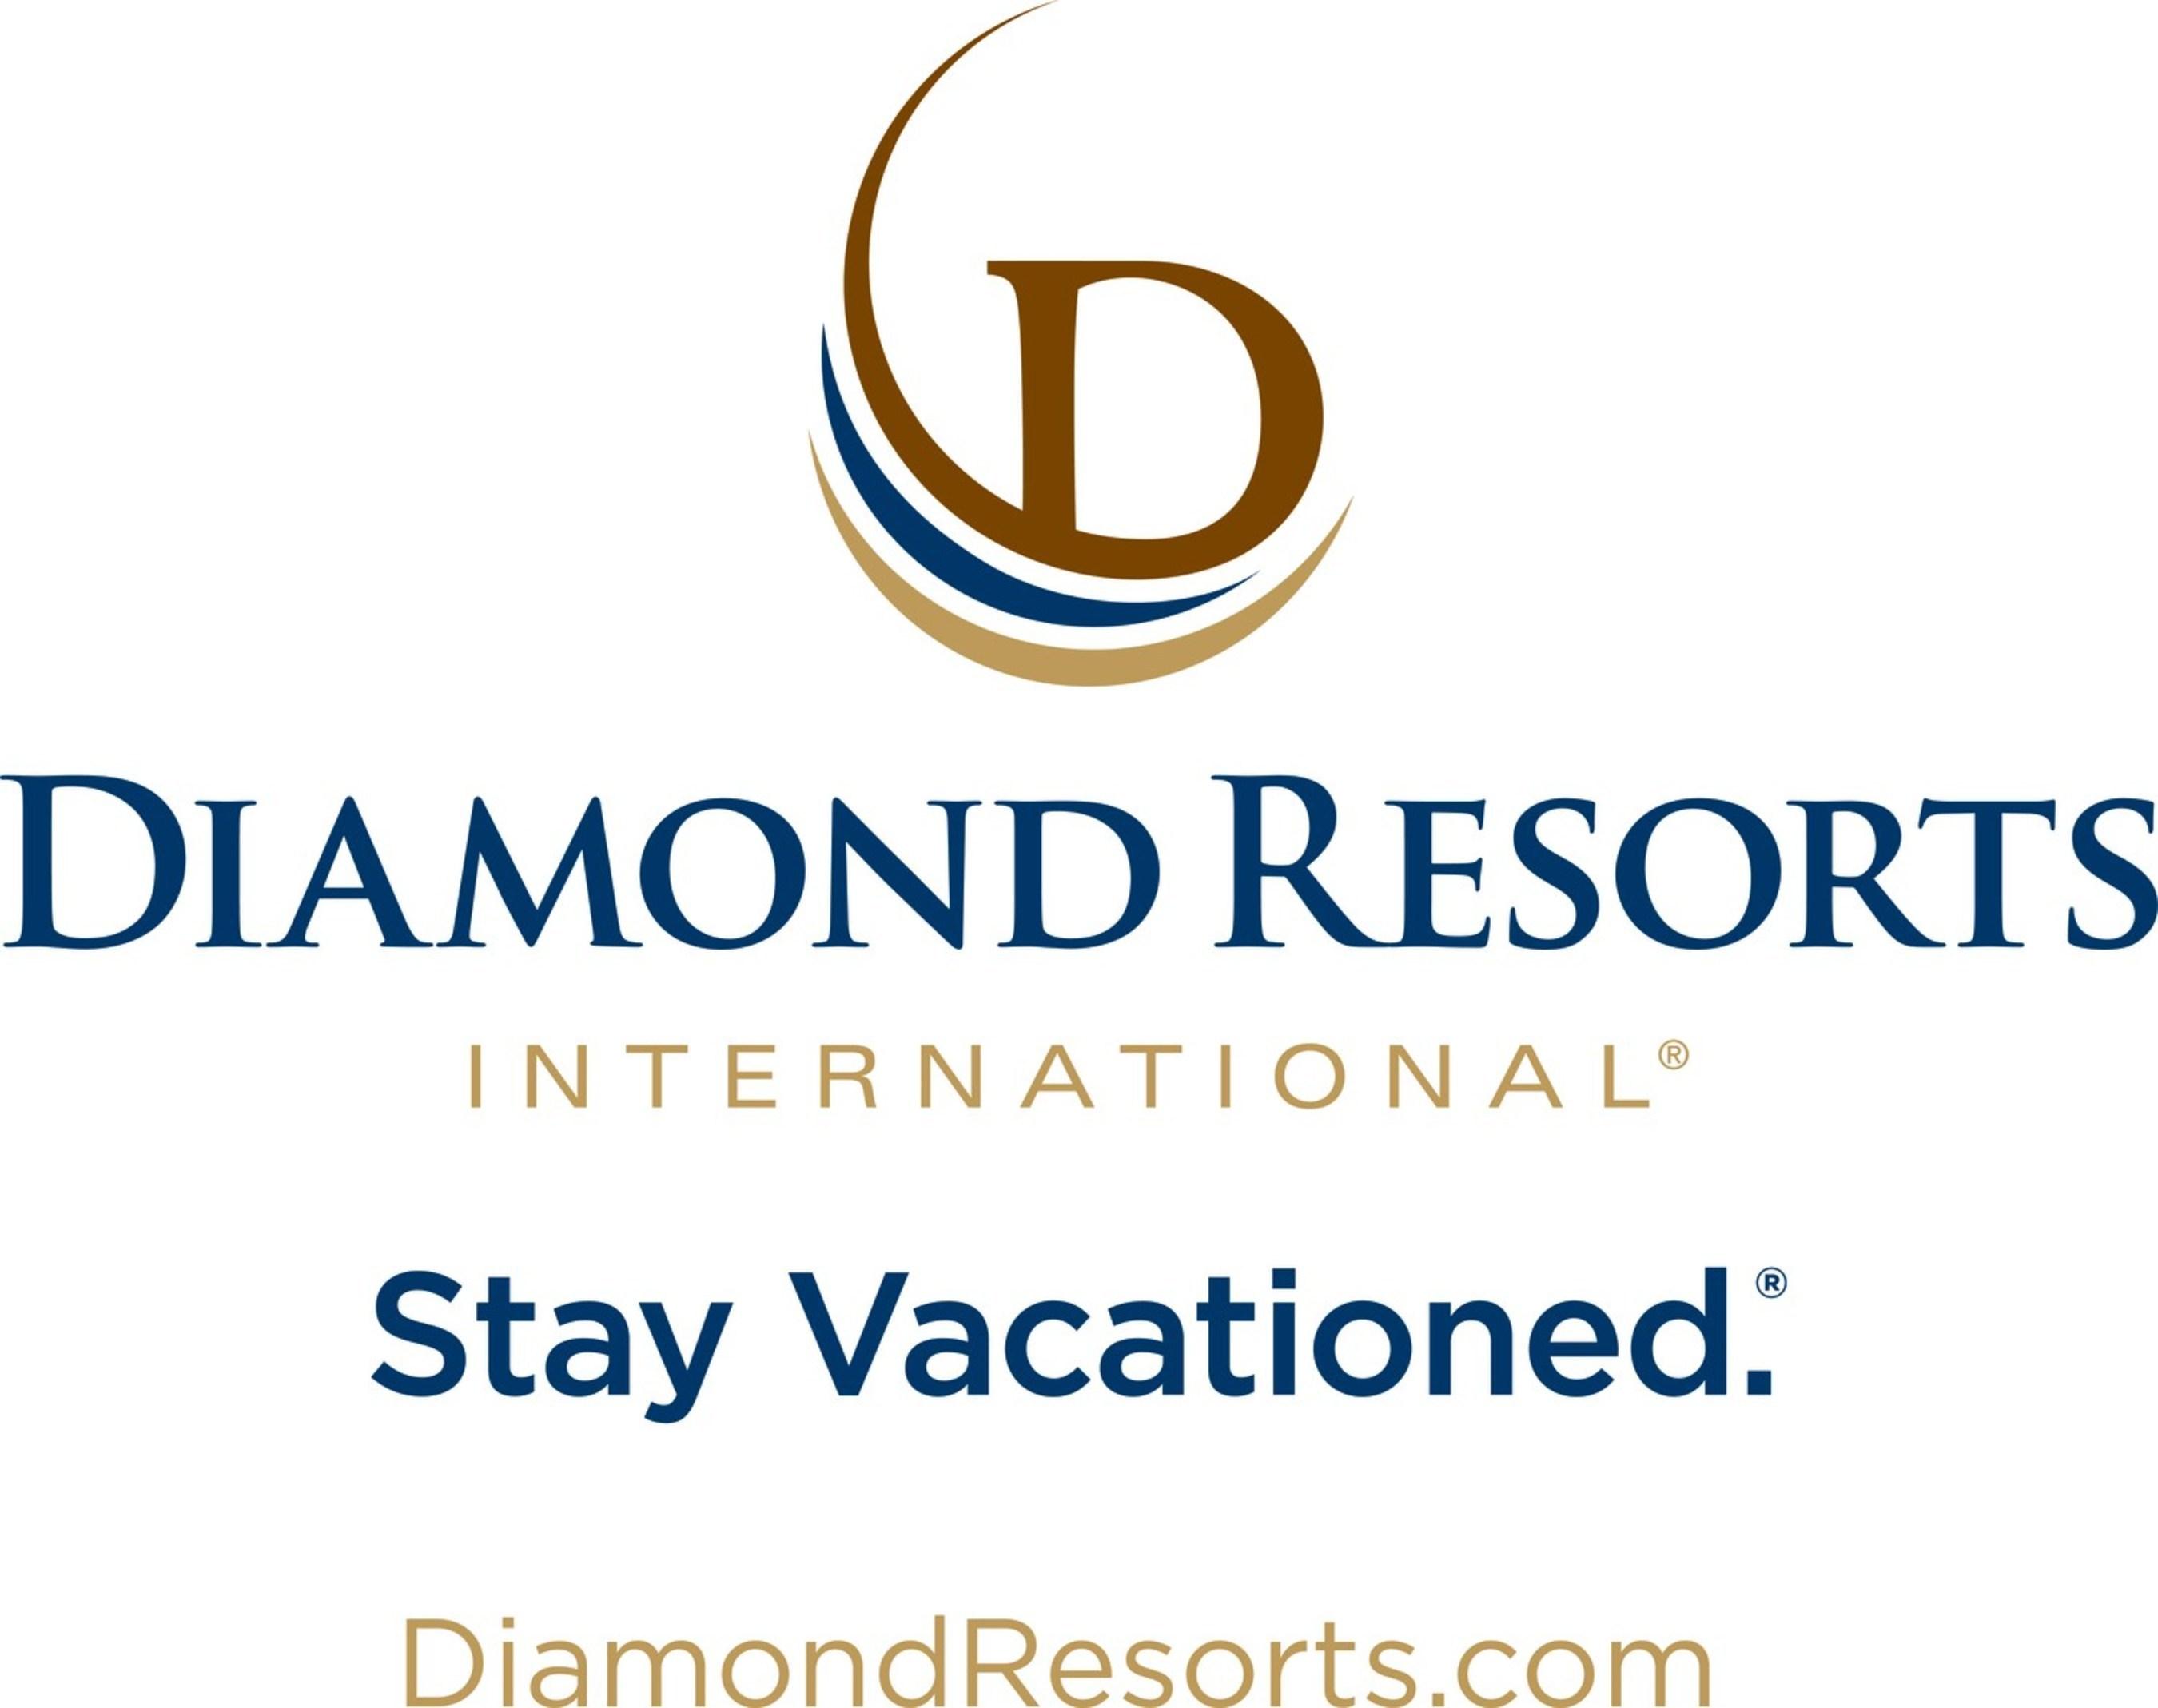 (PRNewsfoto/Diamond Resorts International)